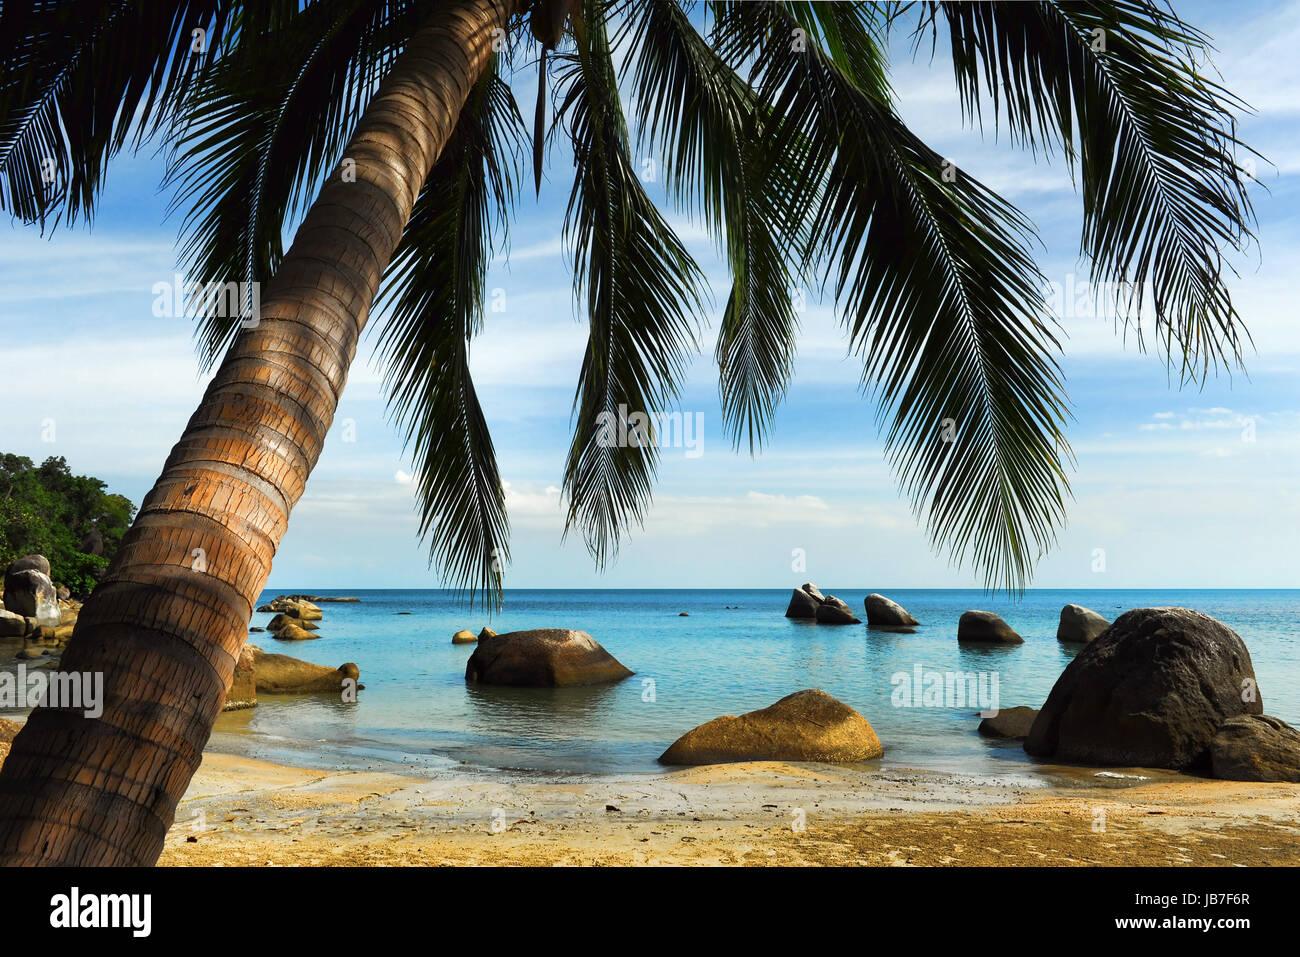 Tropical beach, Thailand - Stock Image